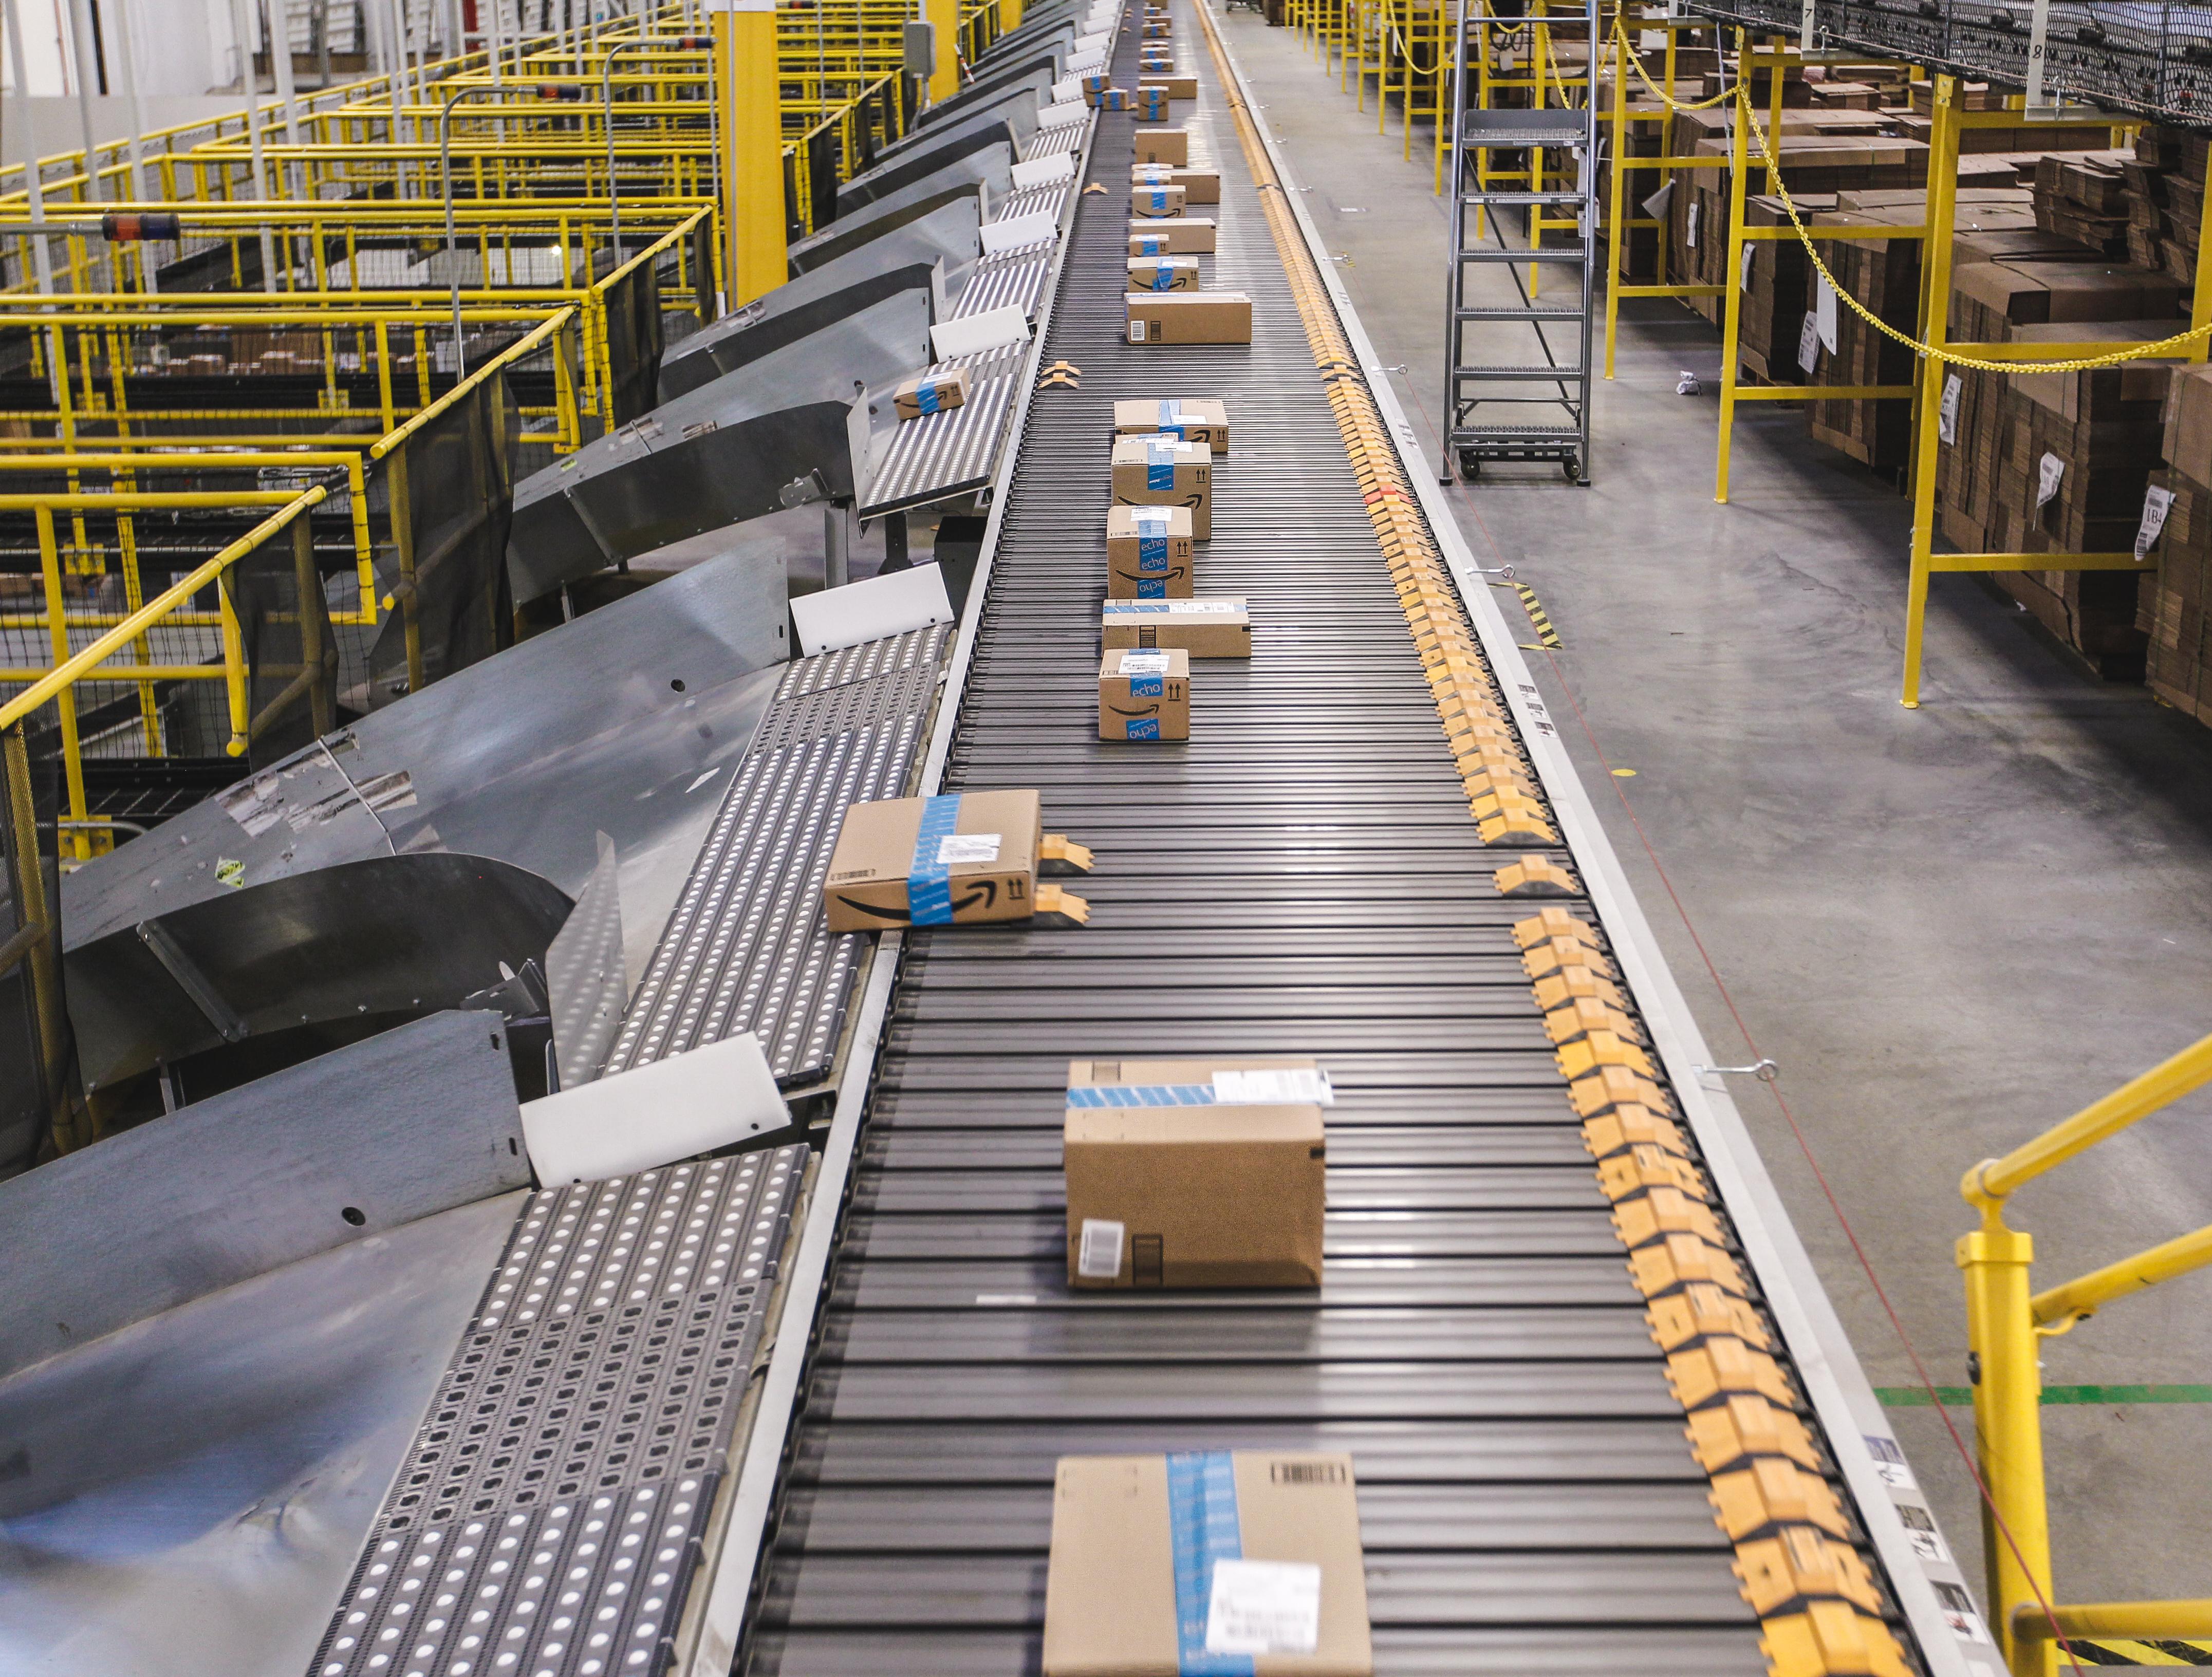 Amazon boxes on conveyor belt in Amazon fulfillment center